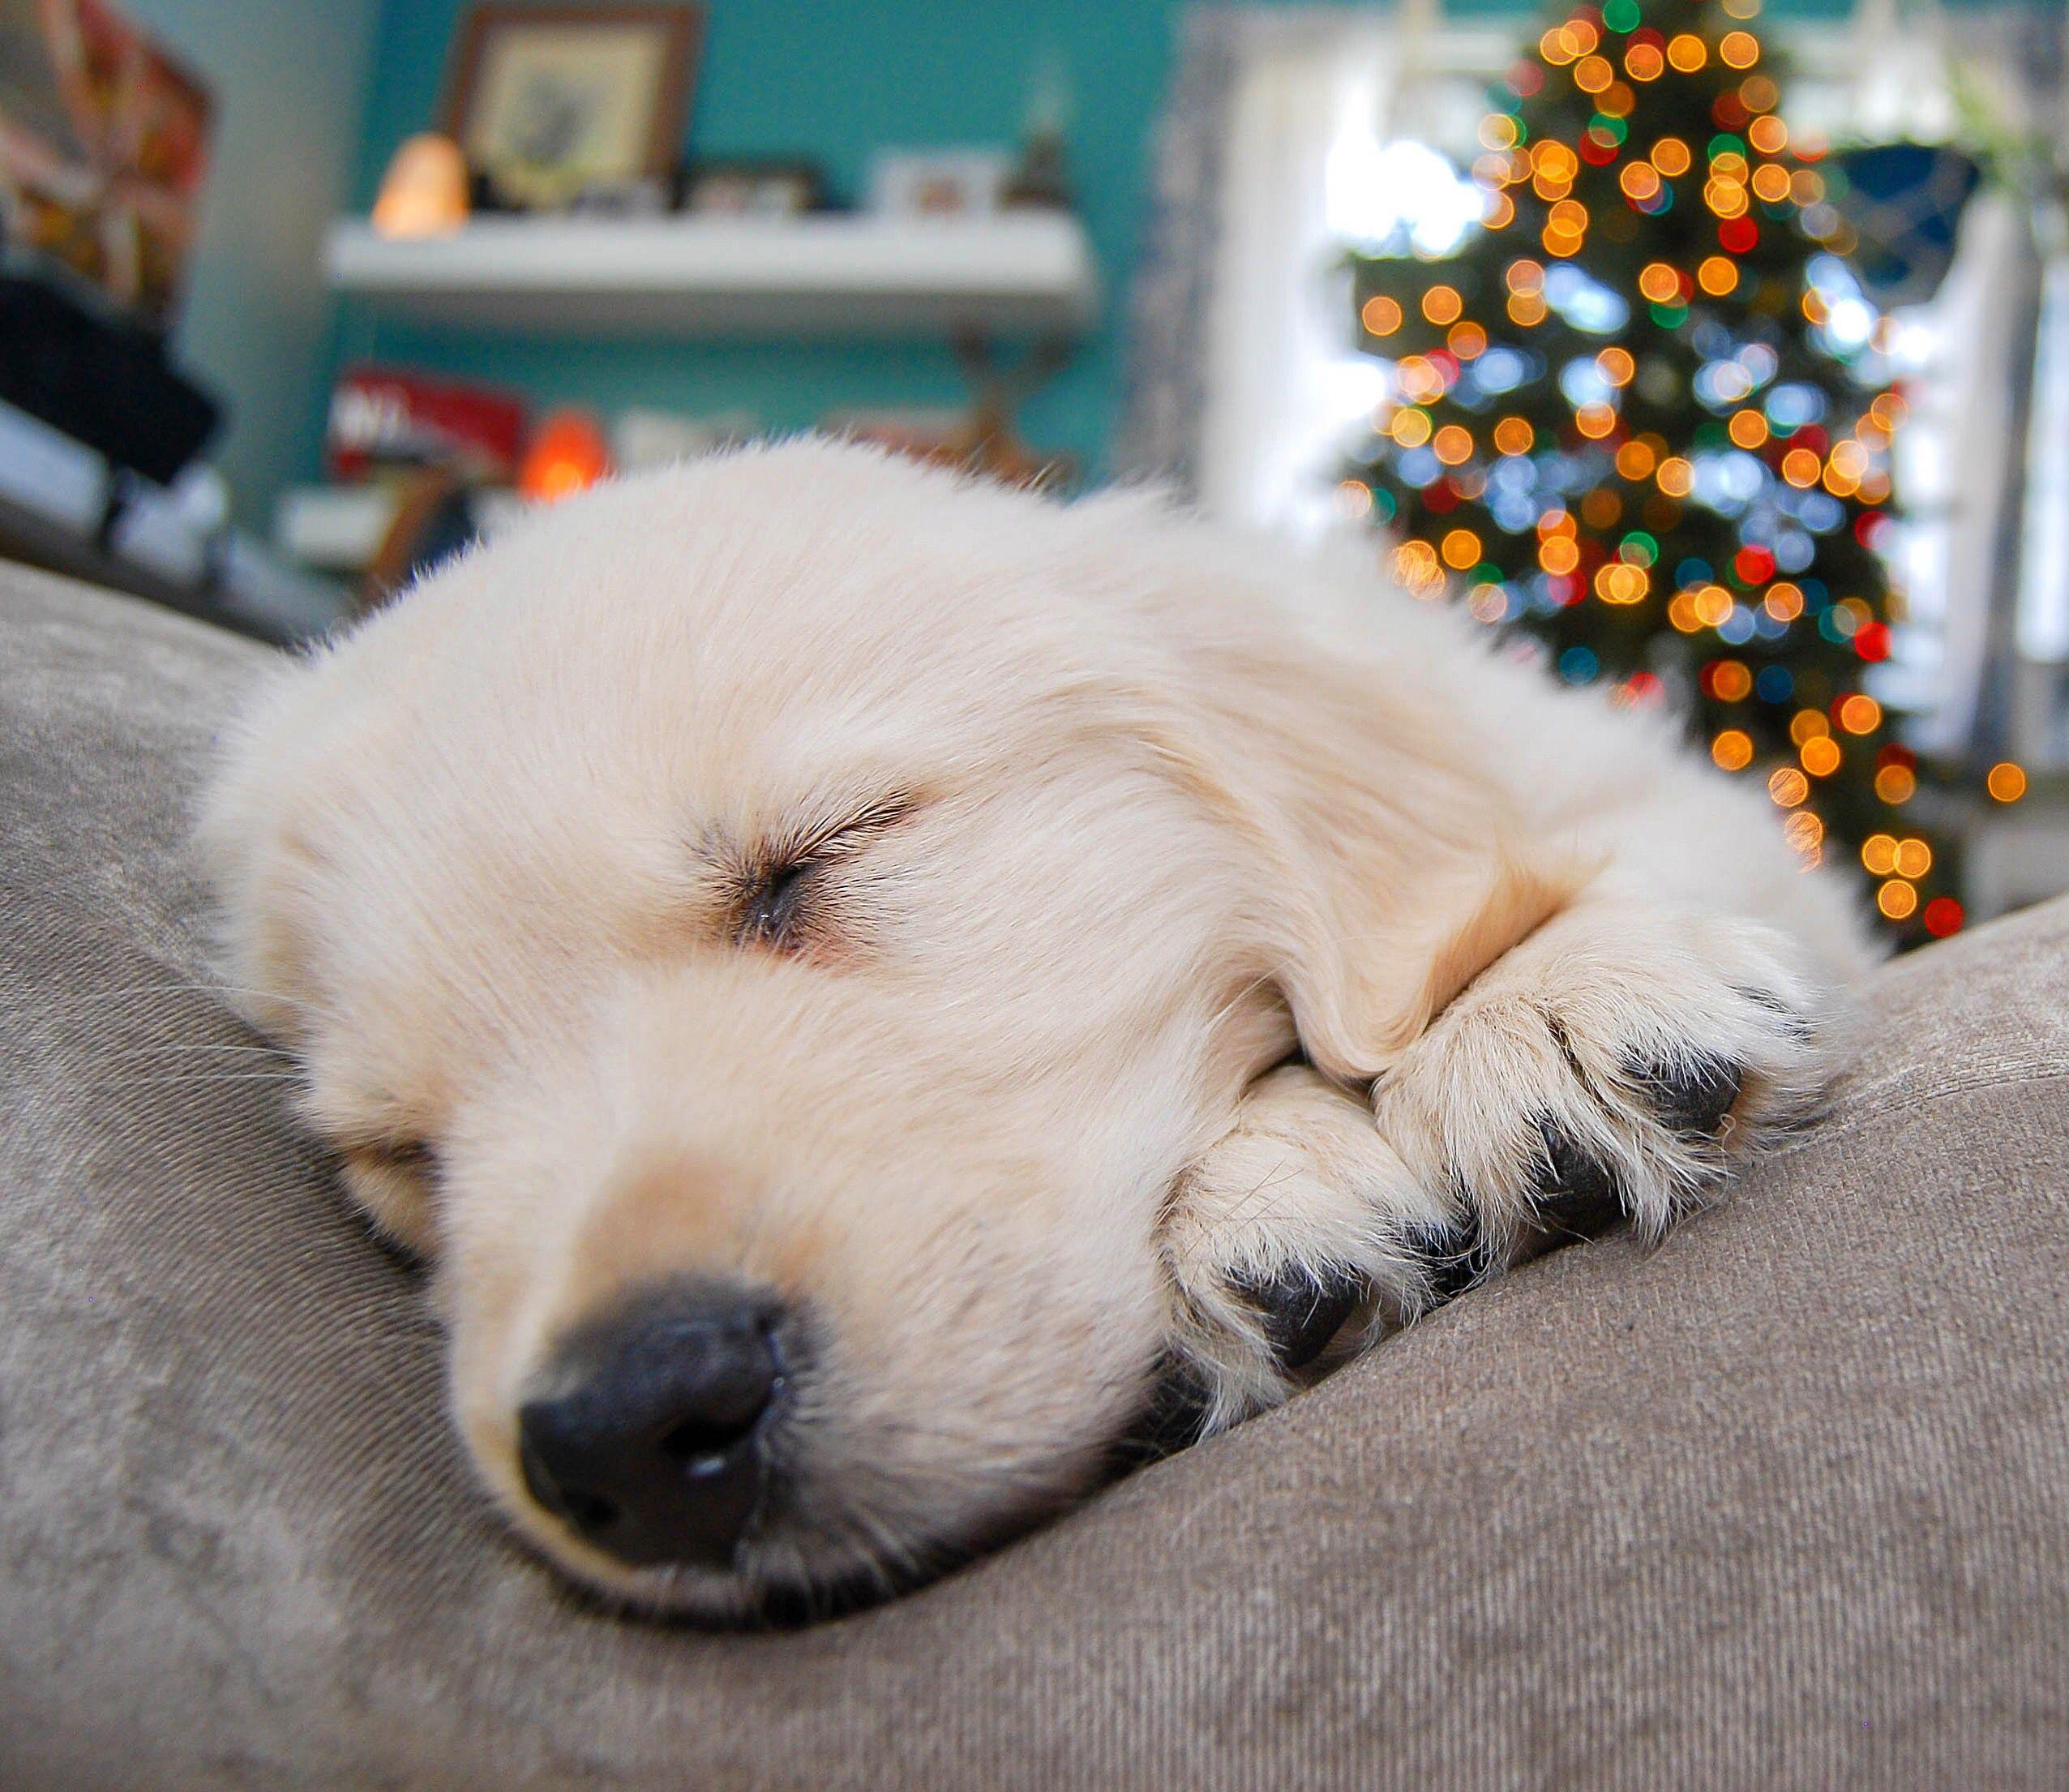 Merry Christmas From Golden Retriever Puppy Jasper The Friendly